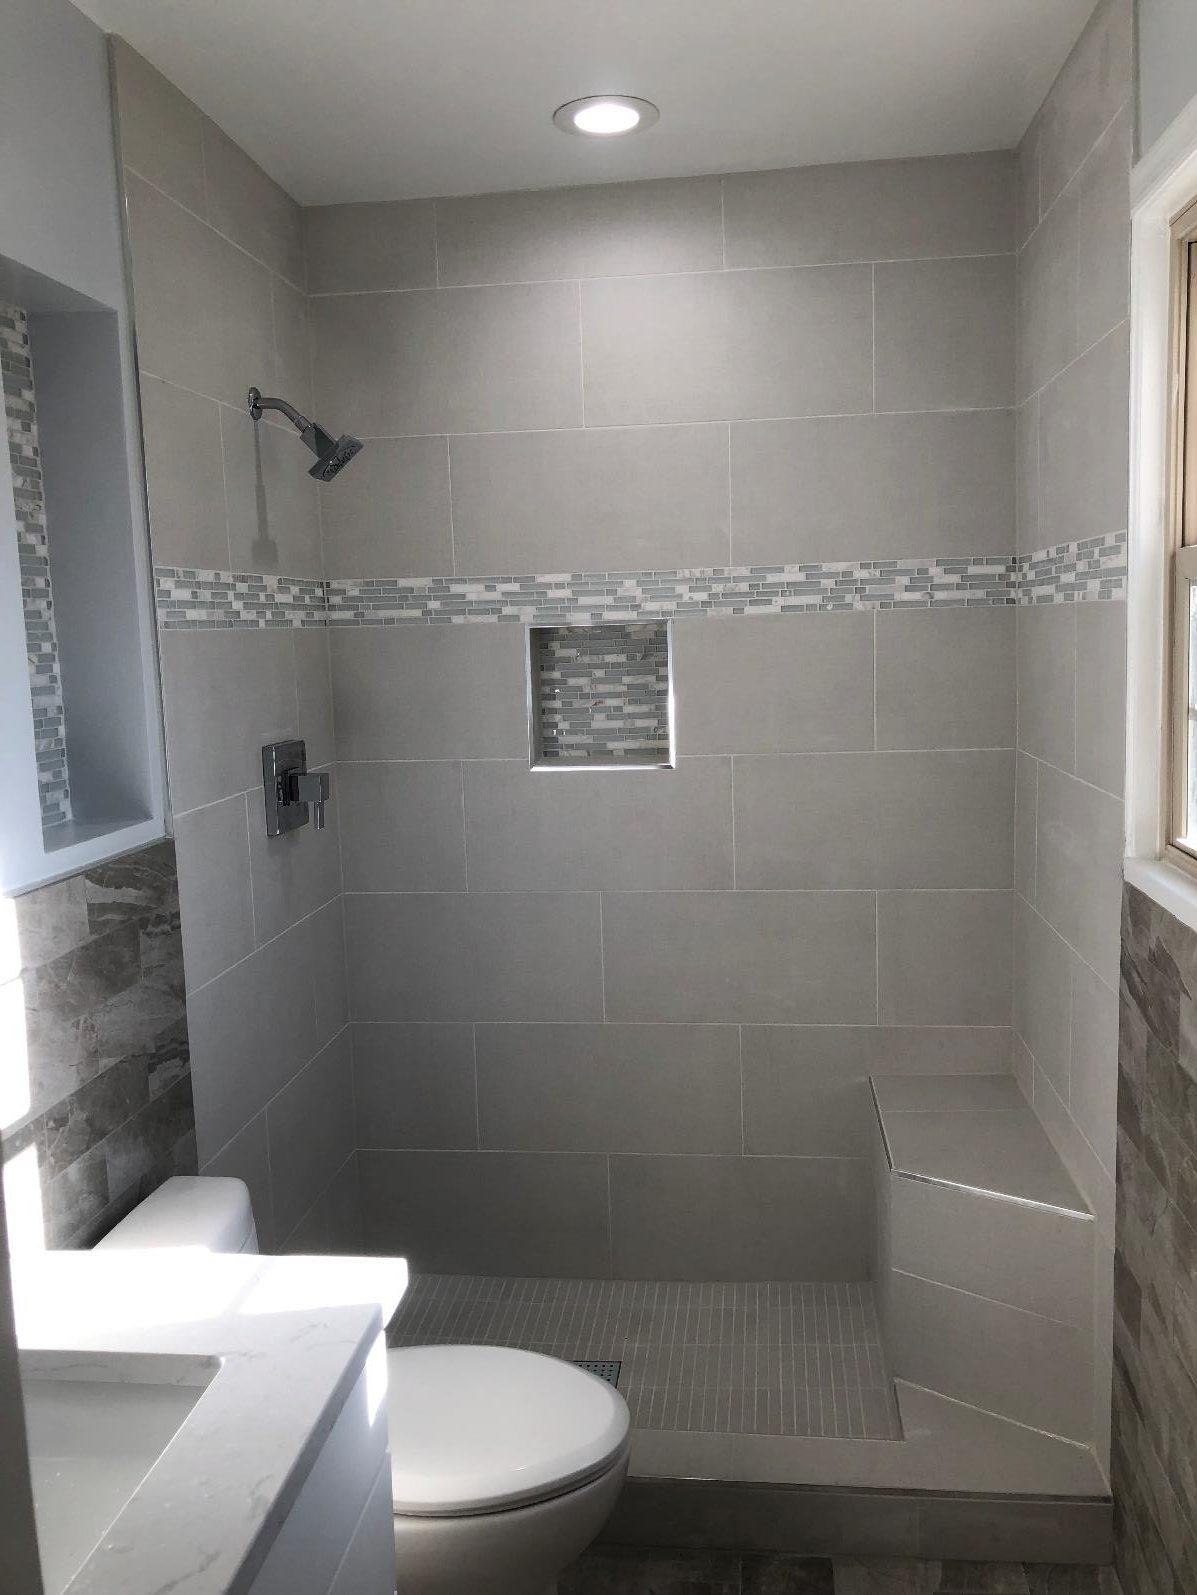 Master bathroom complete remodeling project